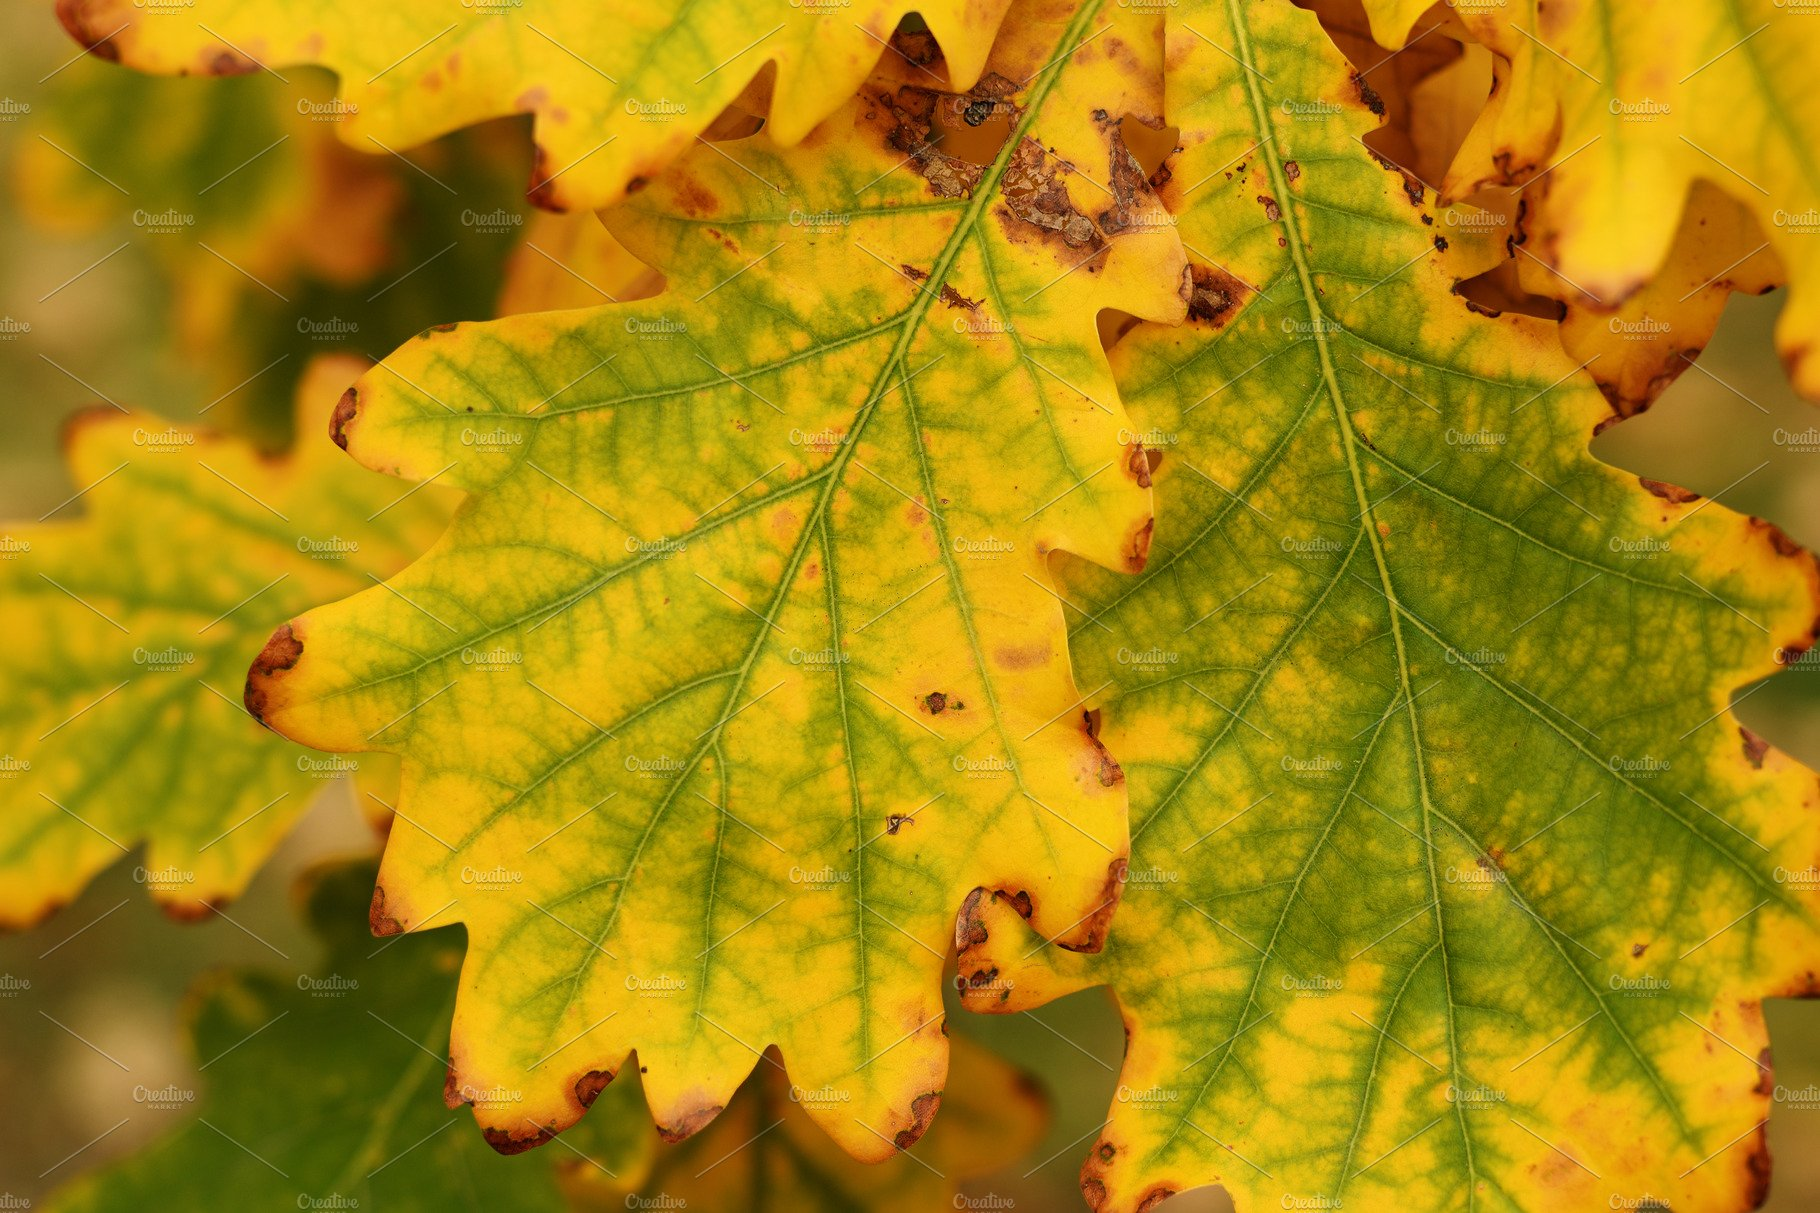 Autumn Oak Leaves Close Up High Quality Nature Stock Photos Creative Market